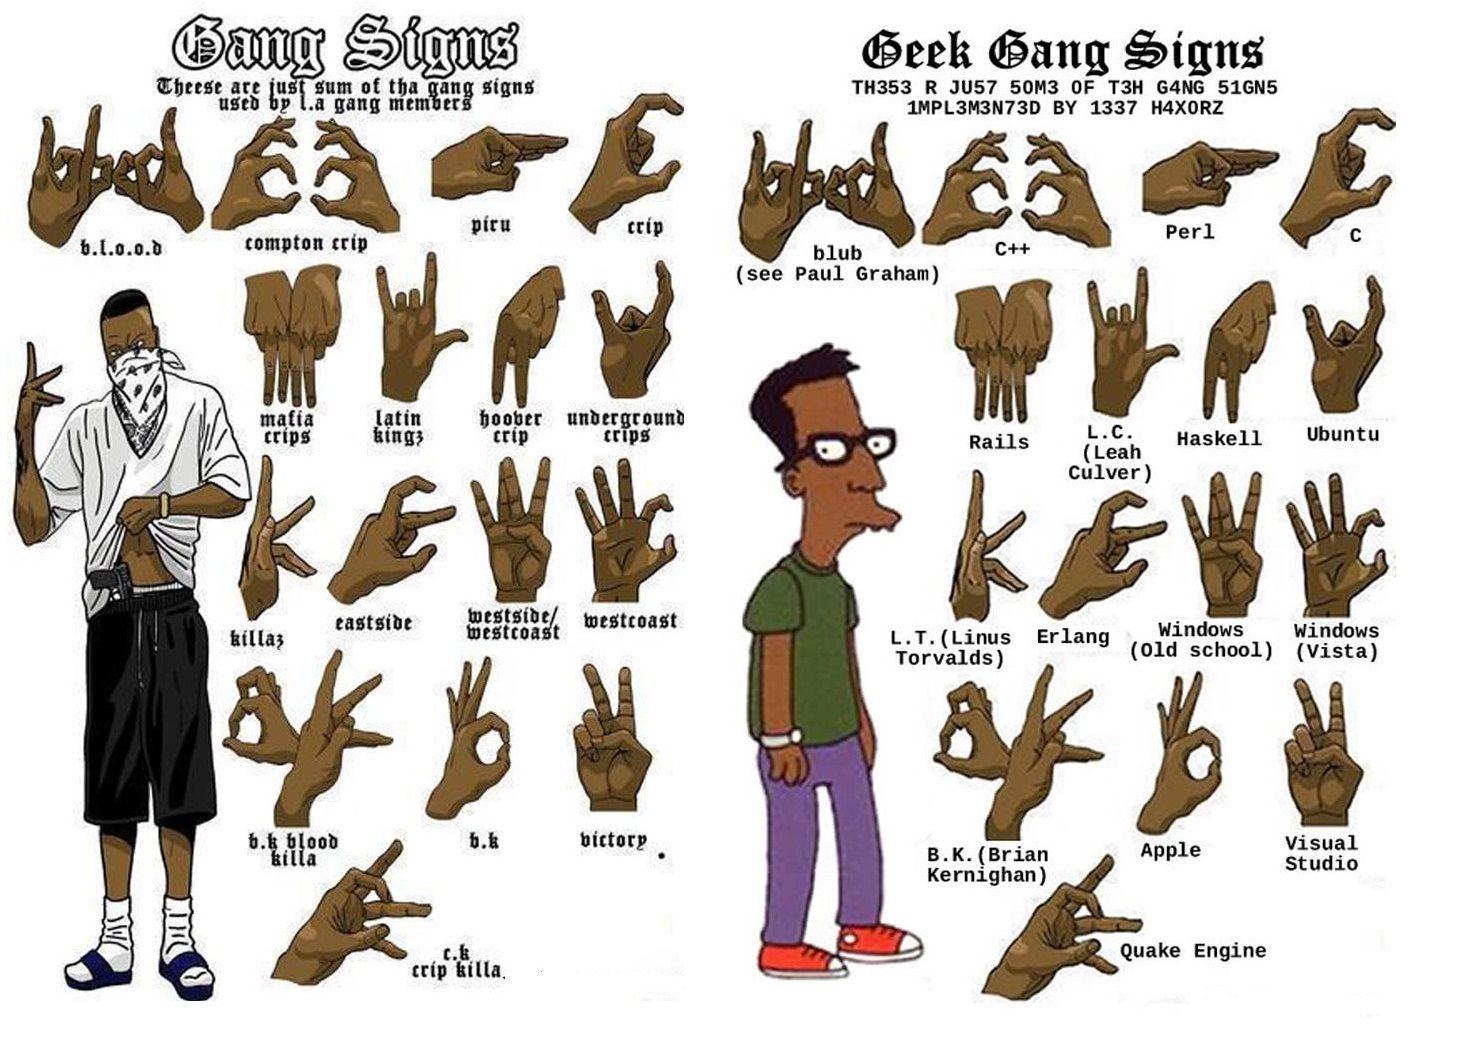 Gang Signs Wallpapers Wallpaper Cave